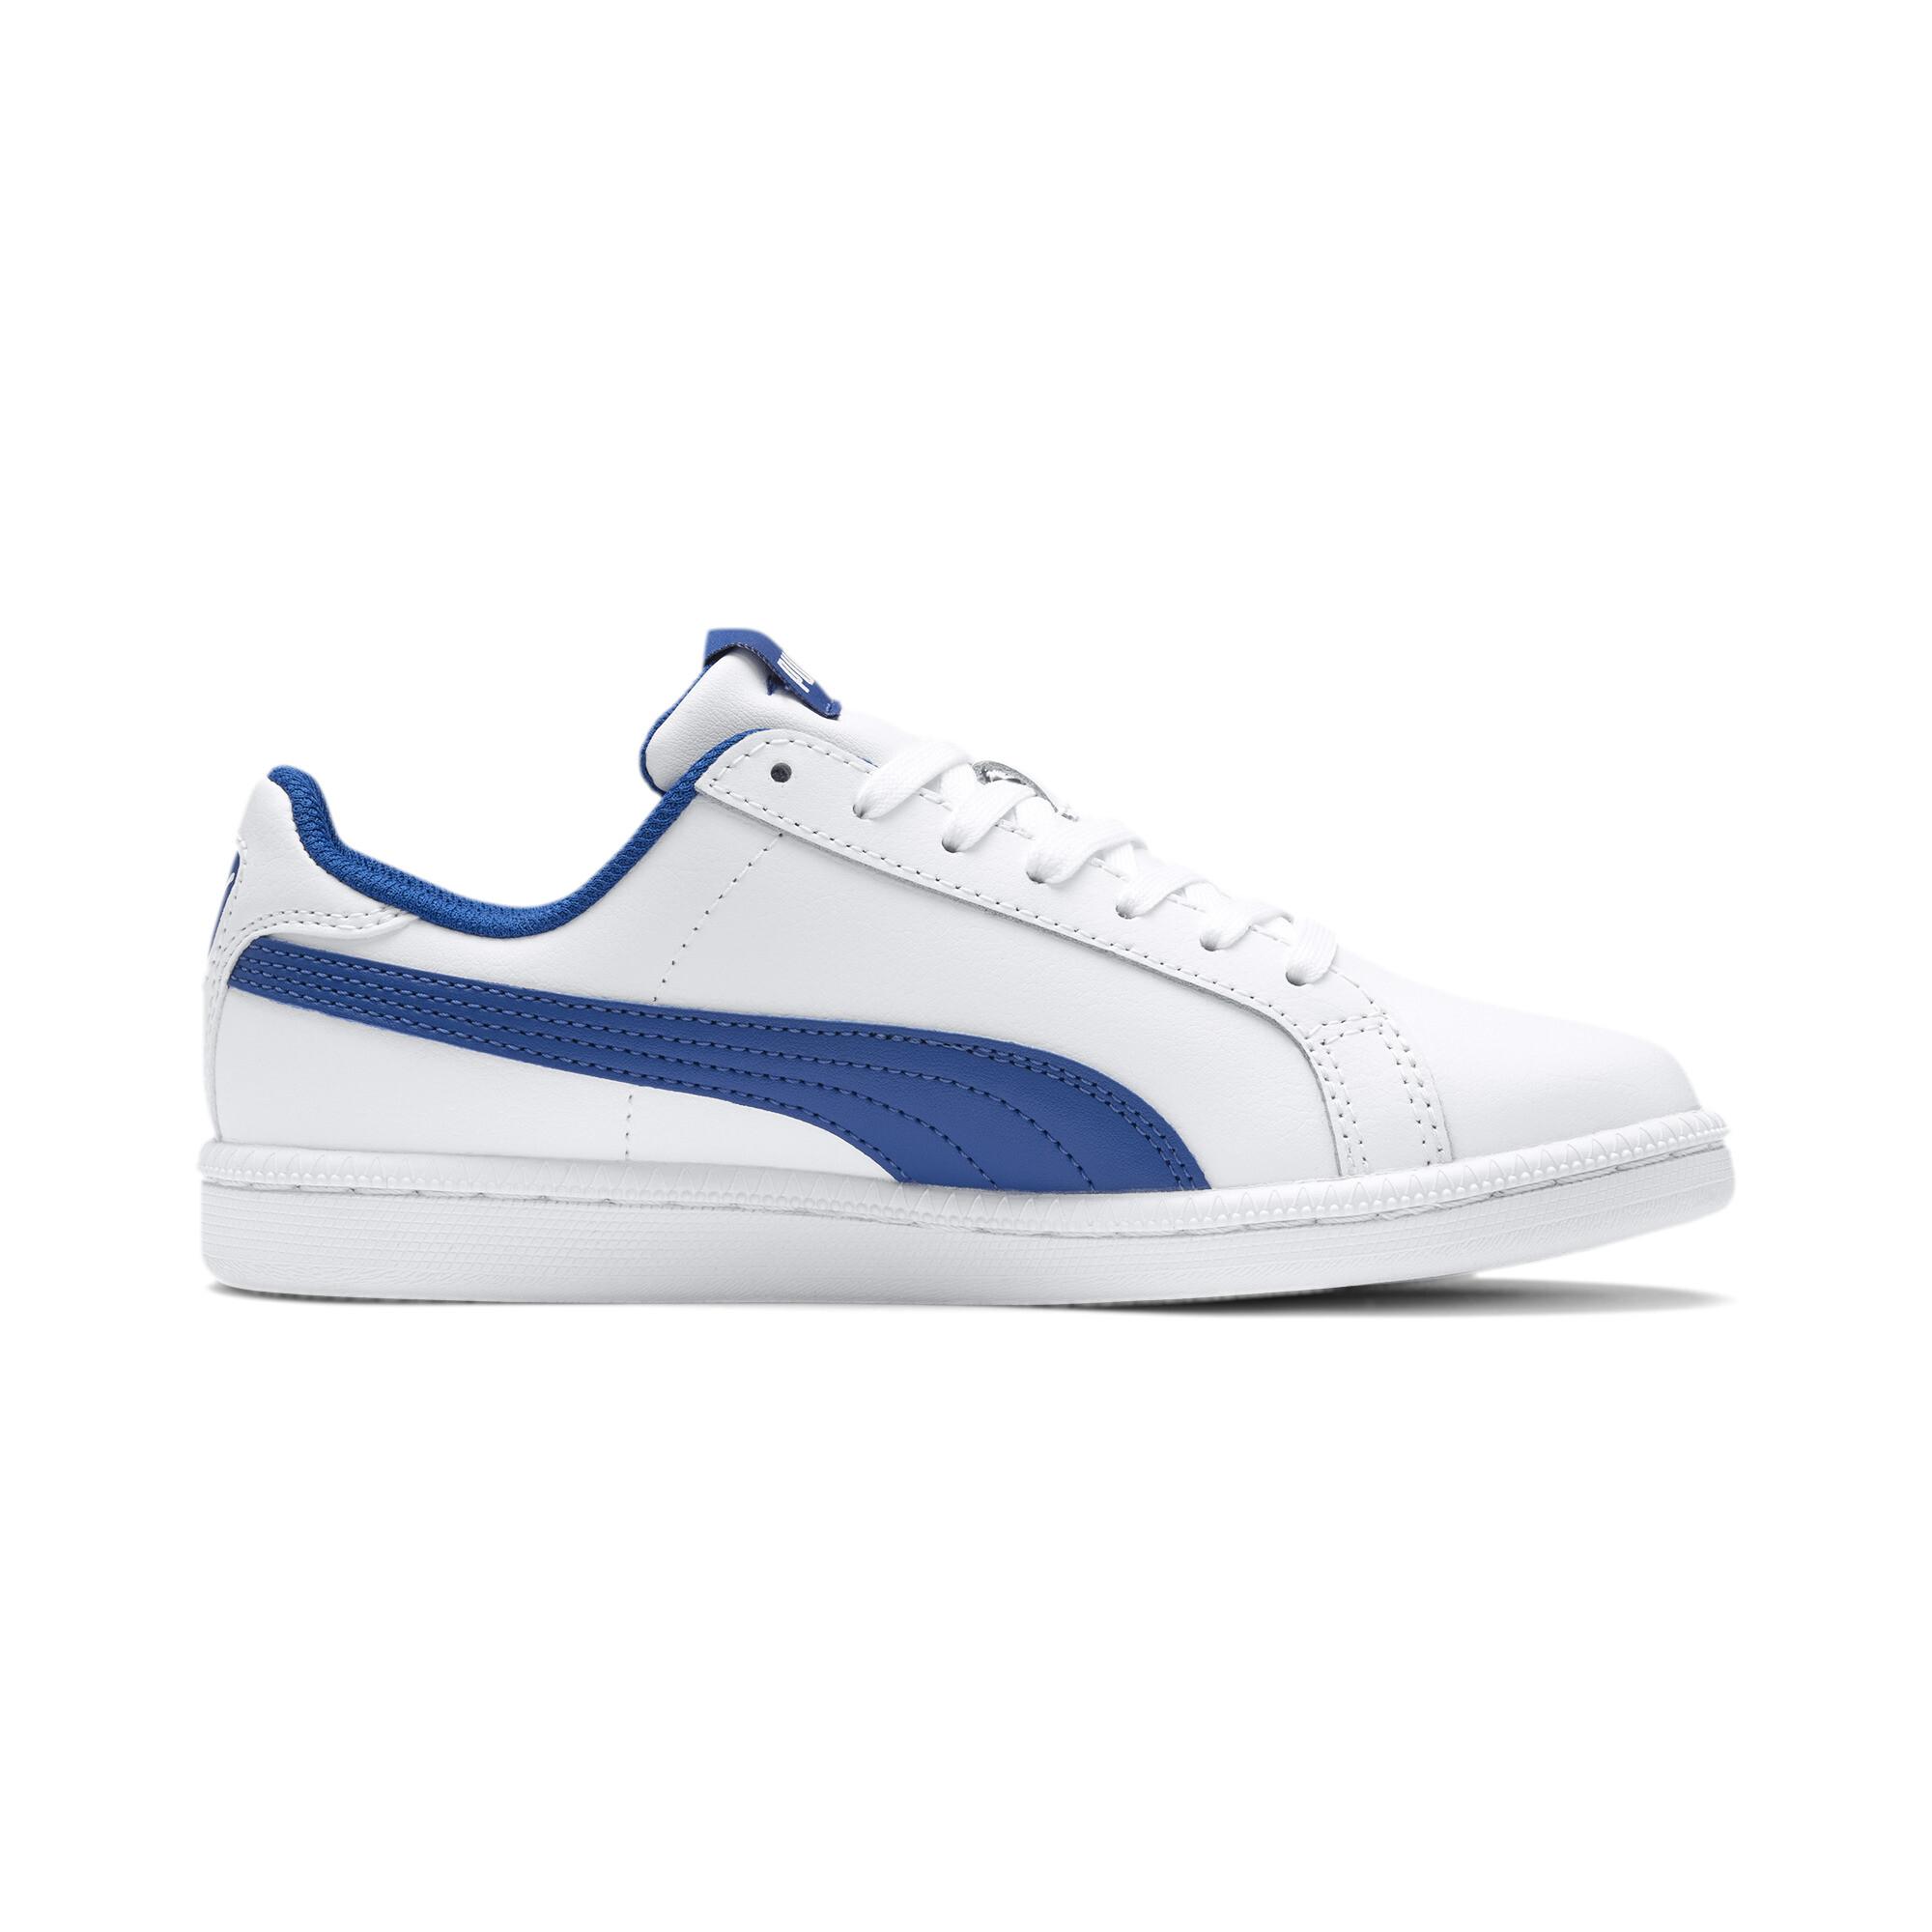 PUMA-Smash-Jr-Sneaker-Unisex-Schuhe-Kinder-Neu Indexbild 16